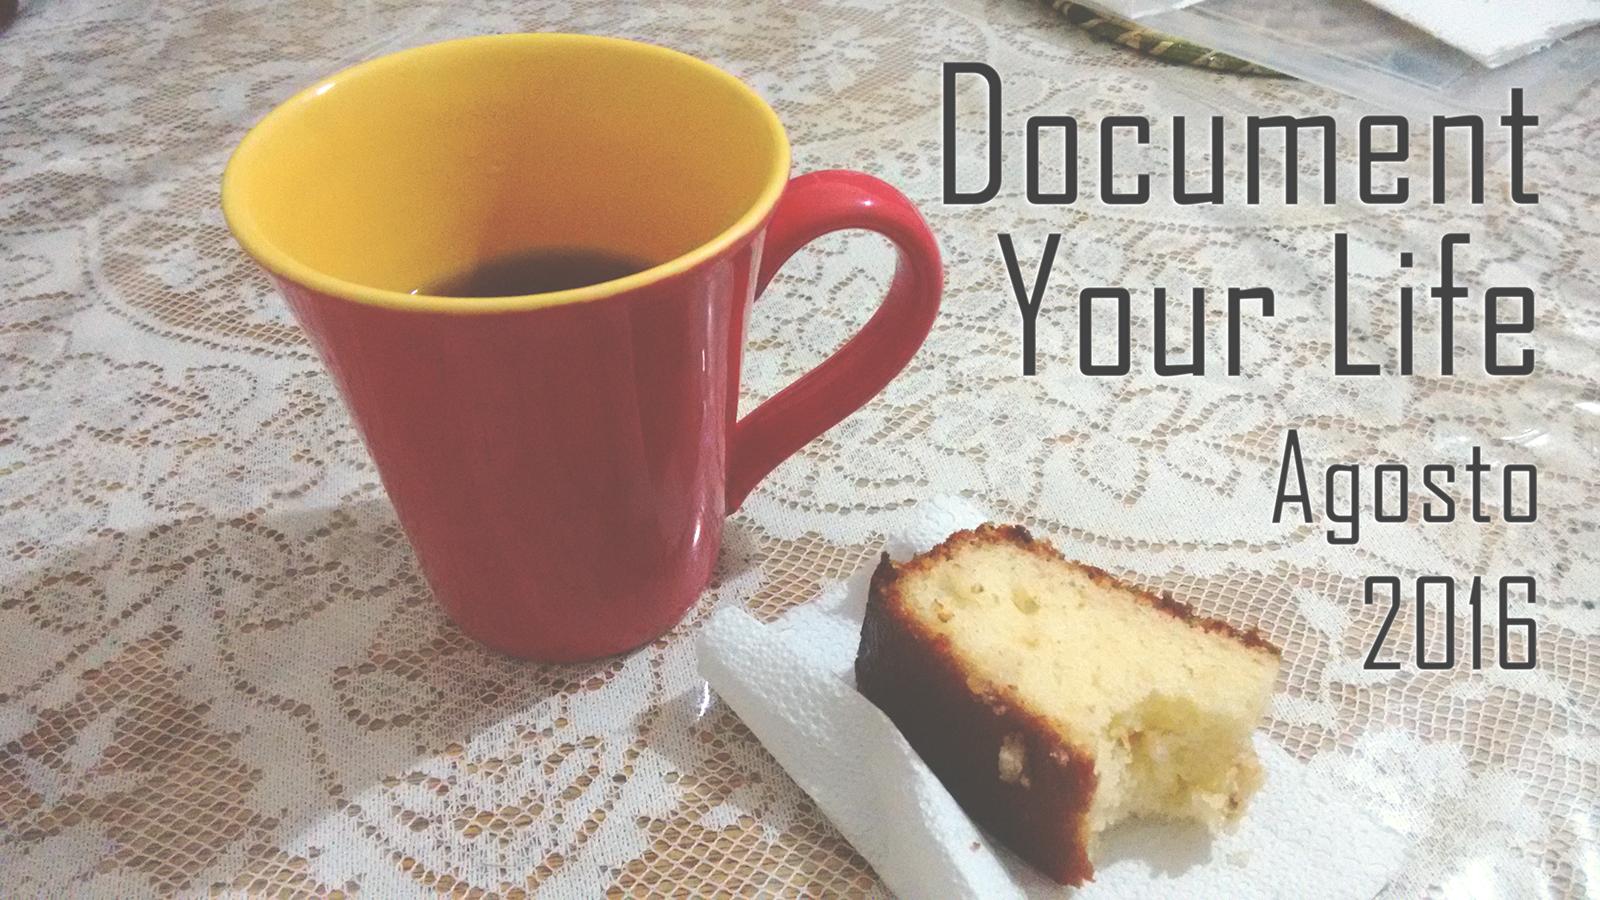 Document Your Life Agosto/16